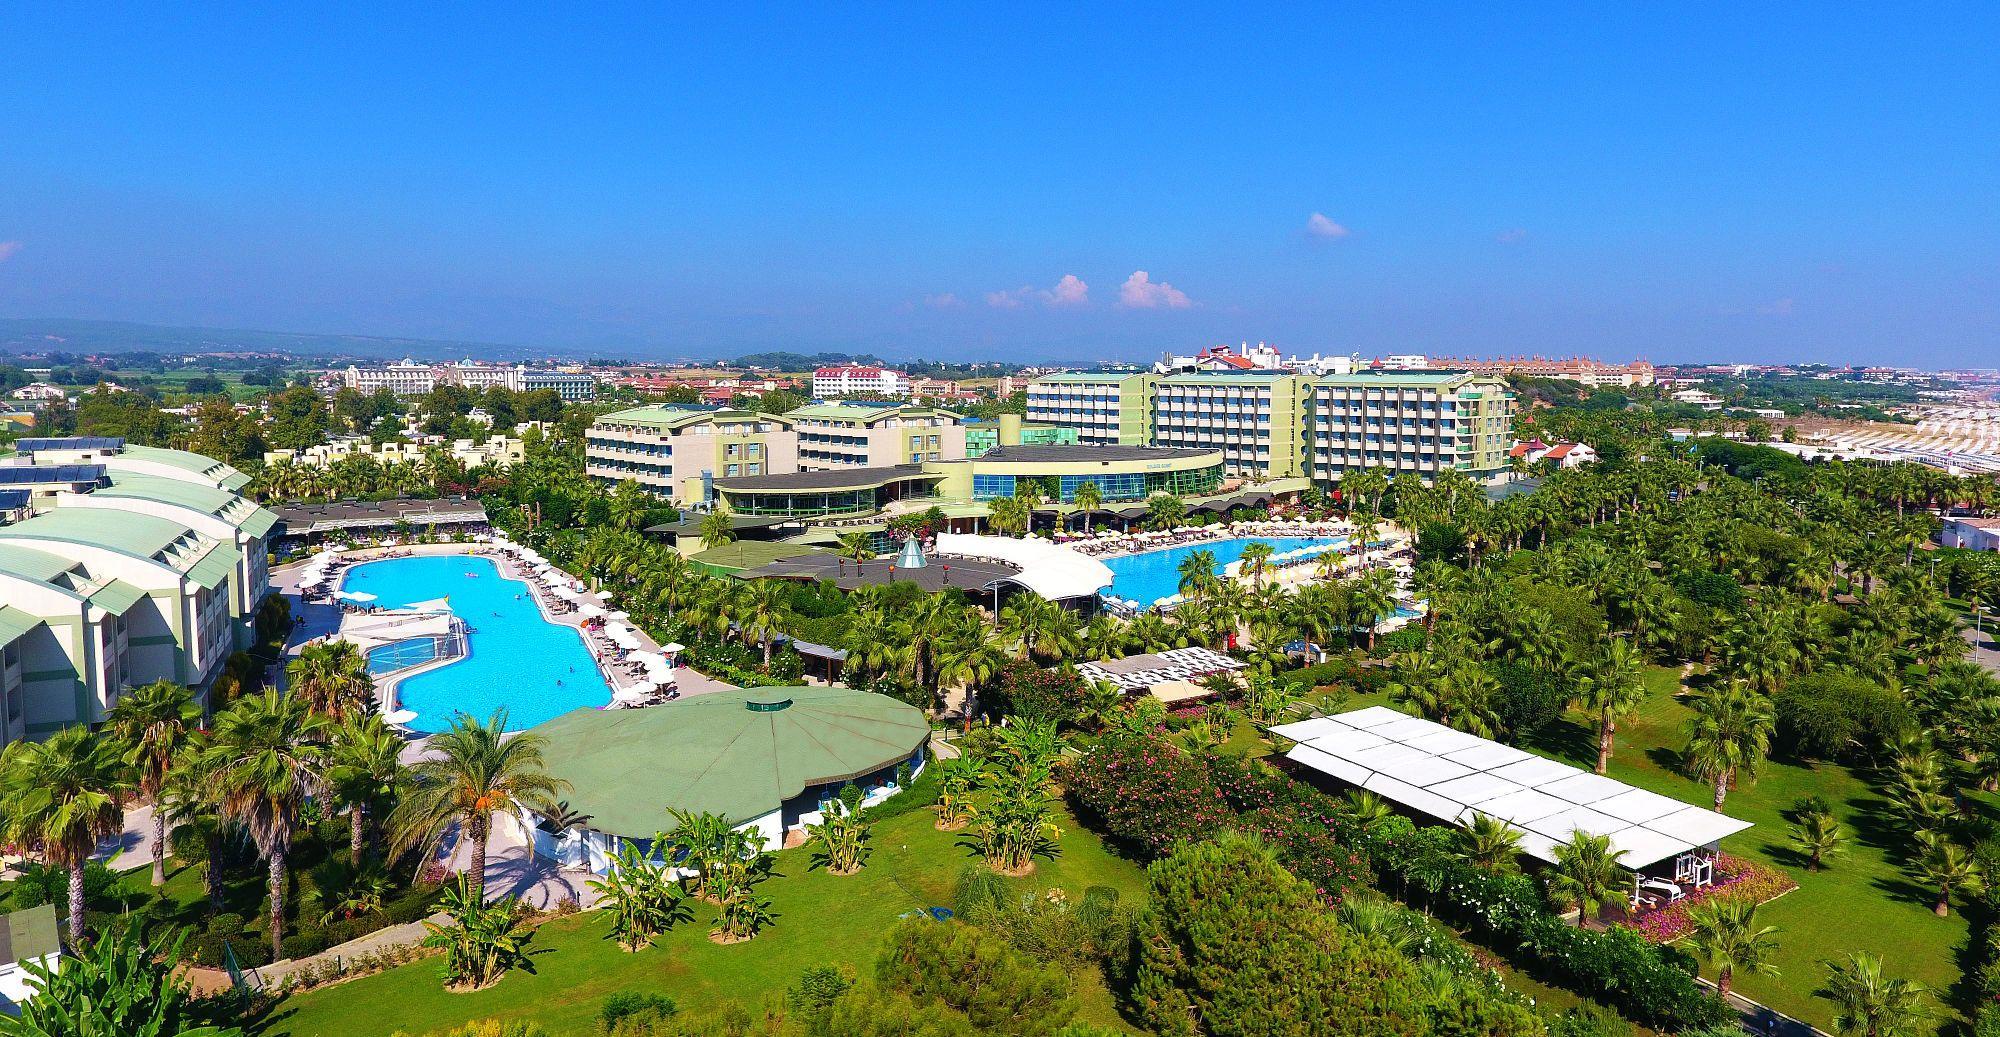 http://www.orextravel.sk/OREX/hotelphotos/vonresort-golden-coast-general-001.jpg